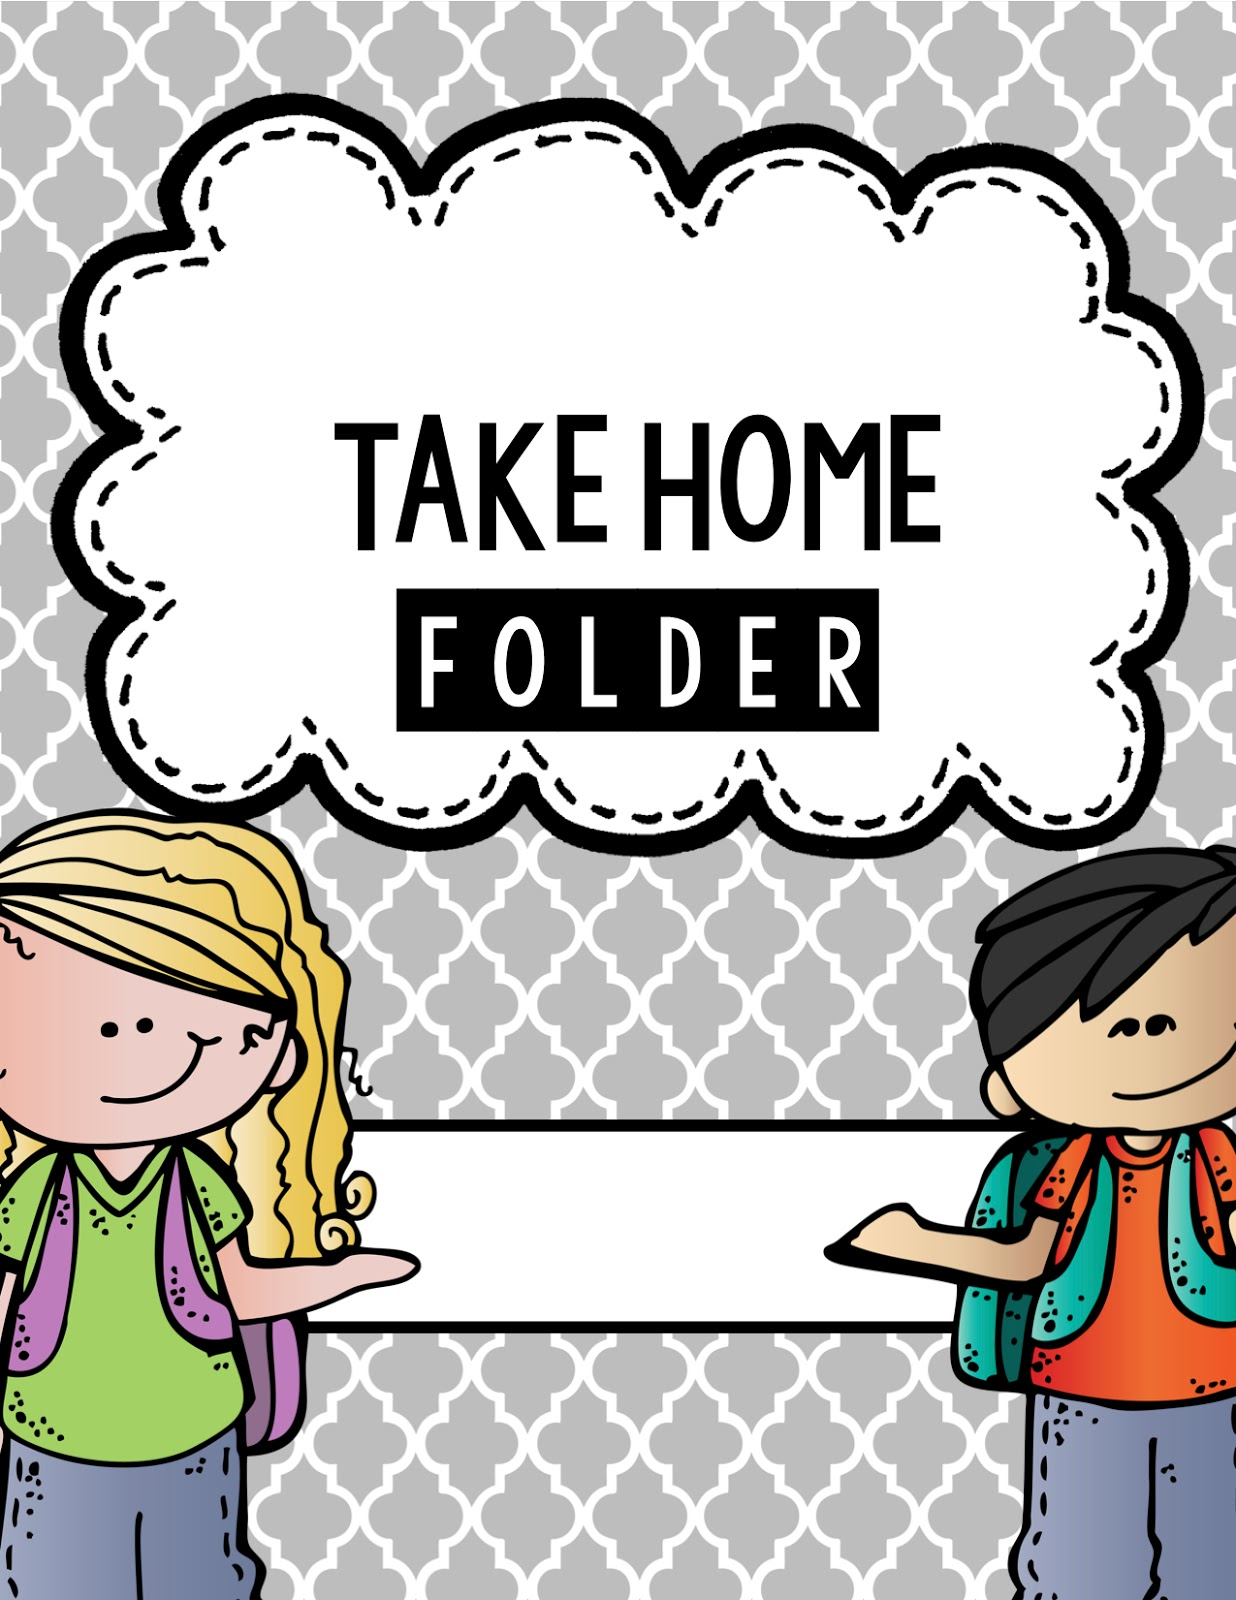 Take home folder clipart.